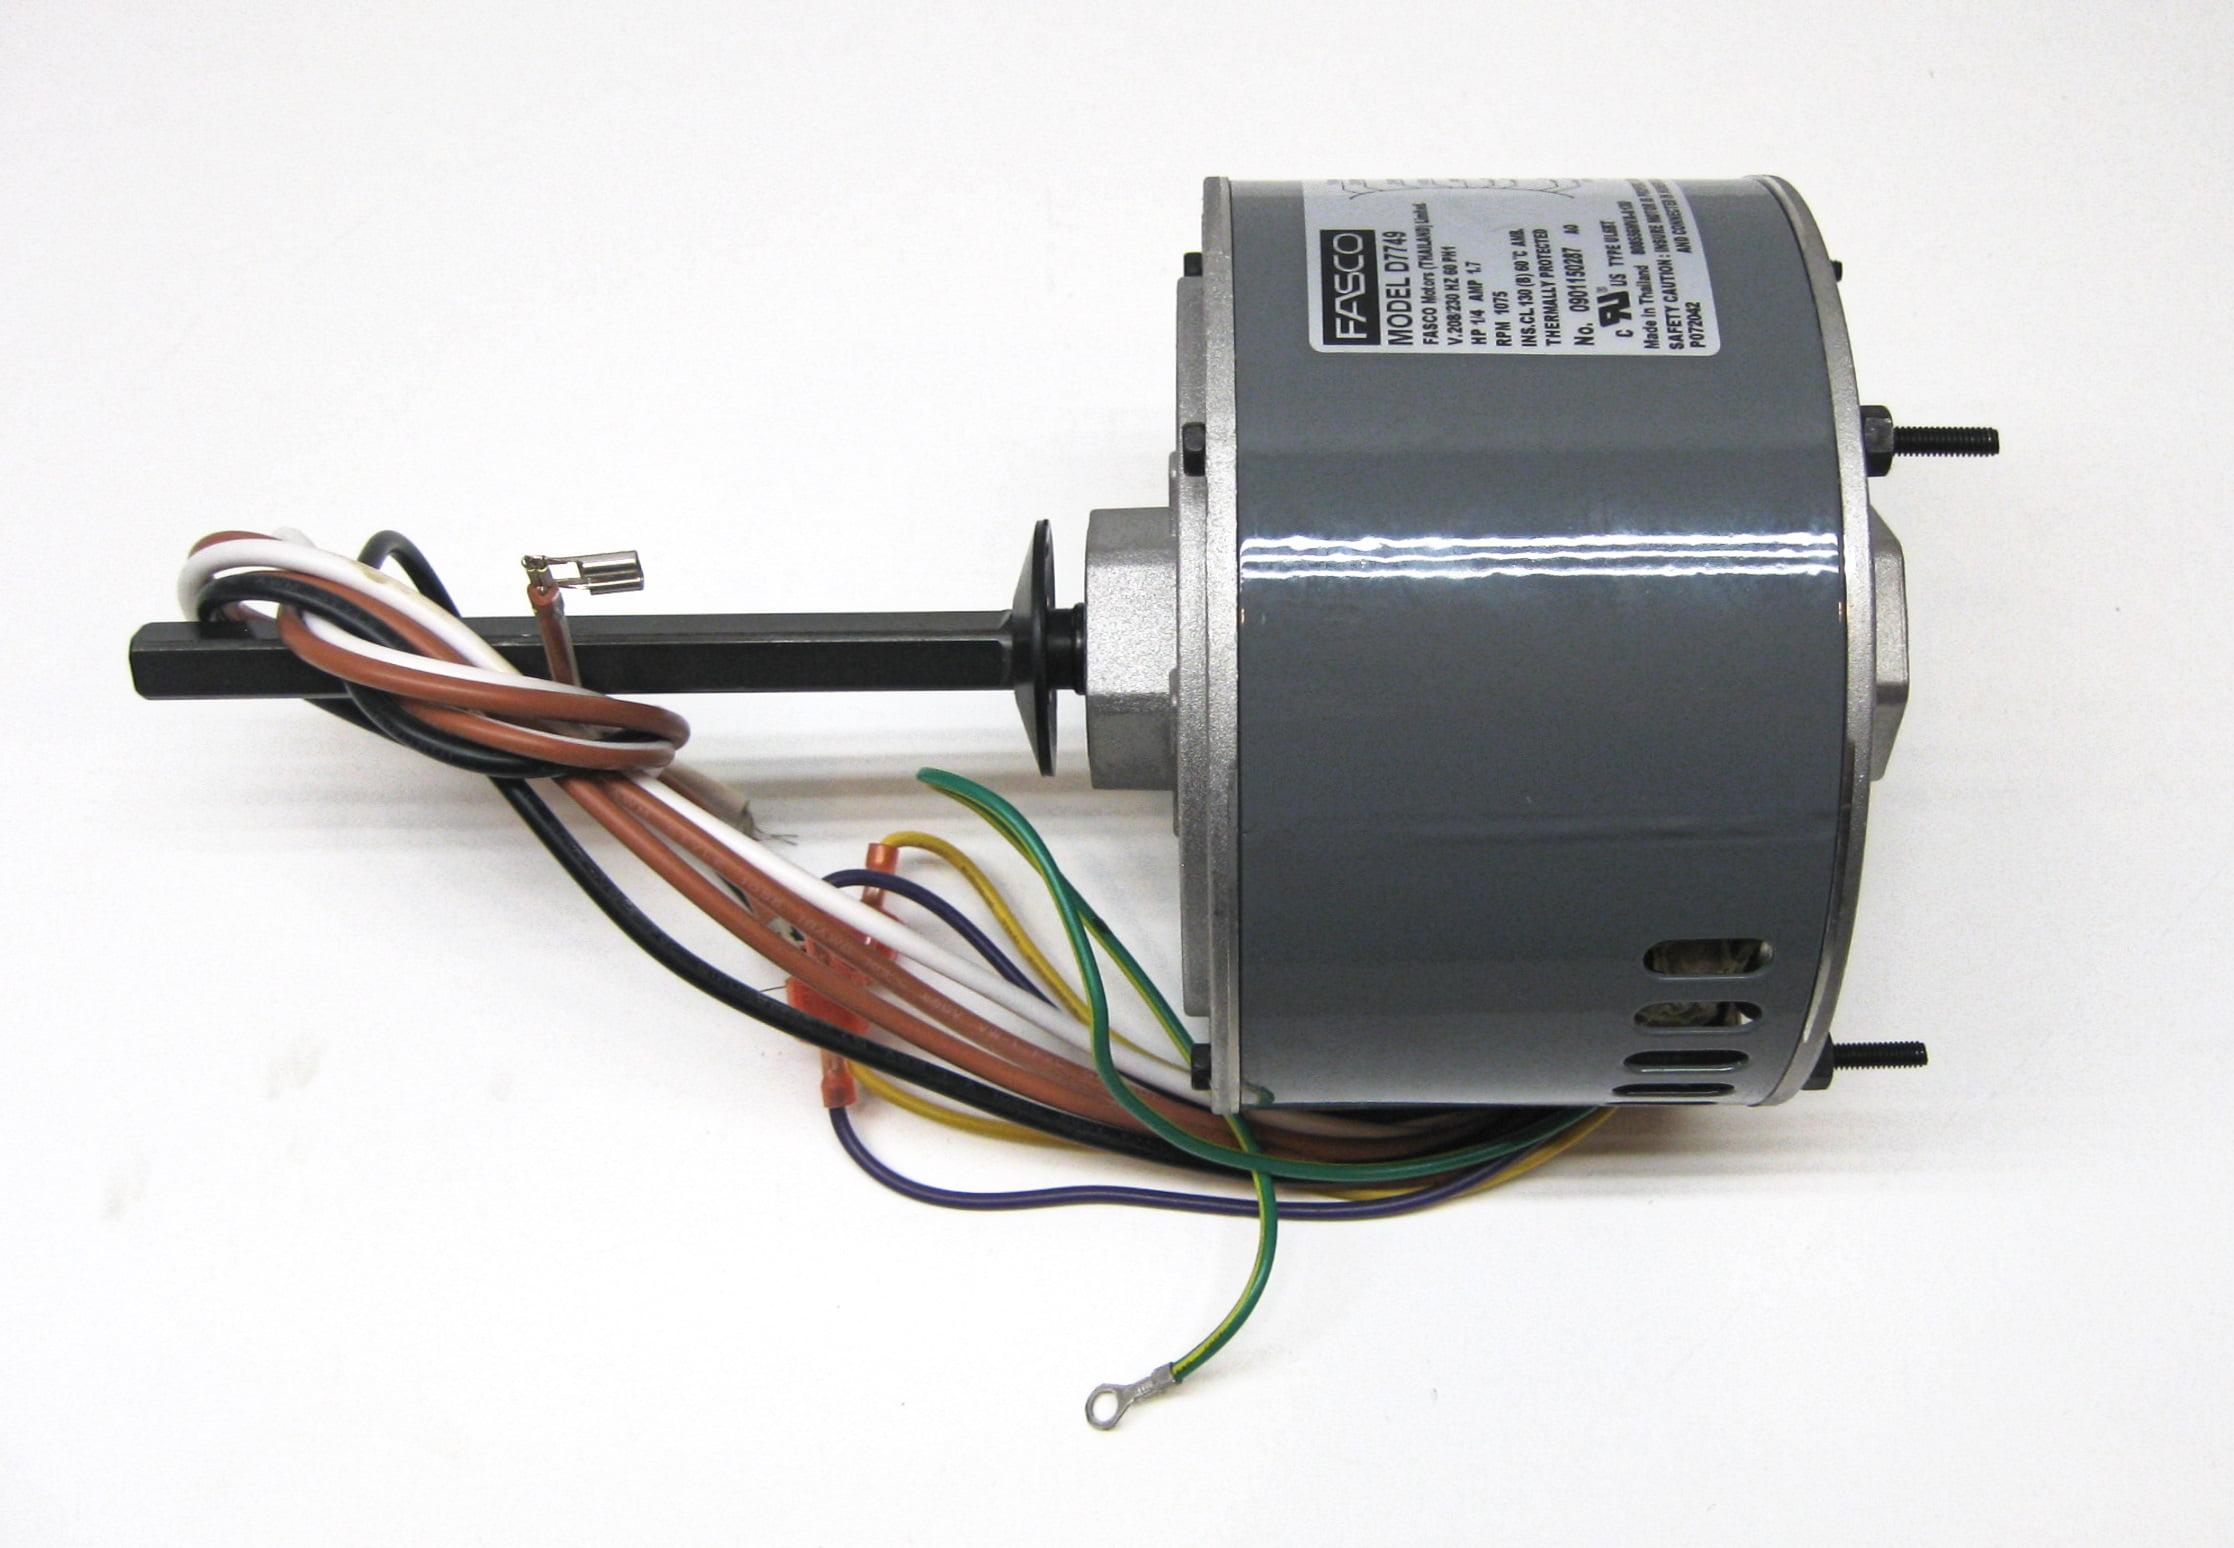 air conditioner condenser fan motor shaft up 1 4 hp 230 volts 1075air conditioner condenser fan motor shaft up 1 4 hp 230 volts 1075 rpm ball bearing single speed for fasco d7749 walmart com